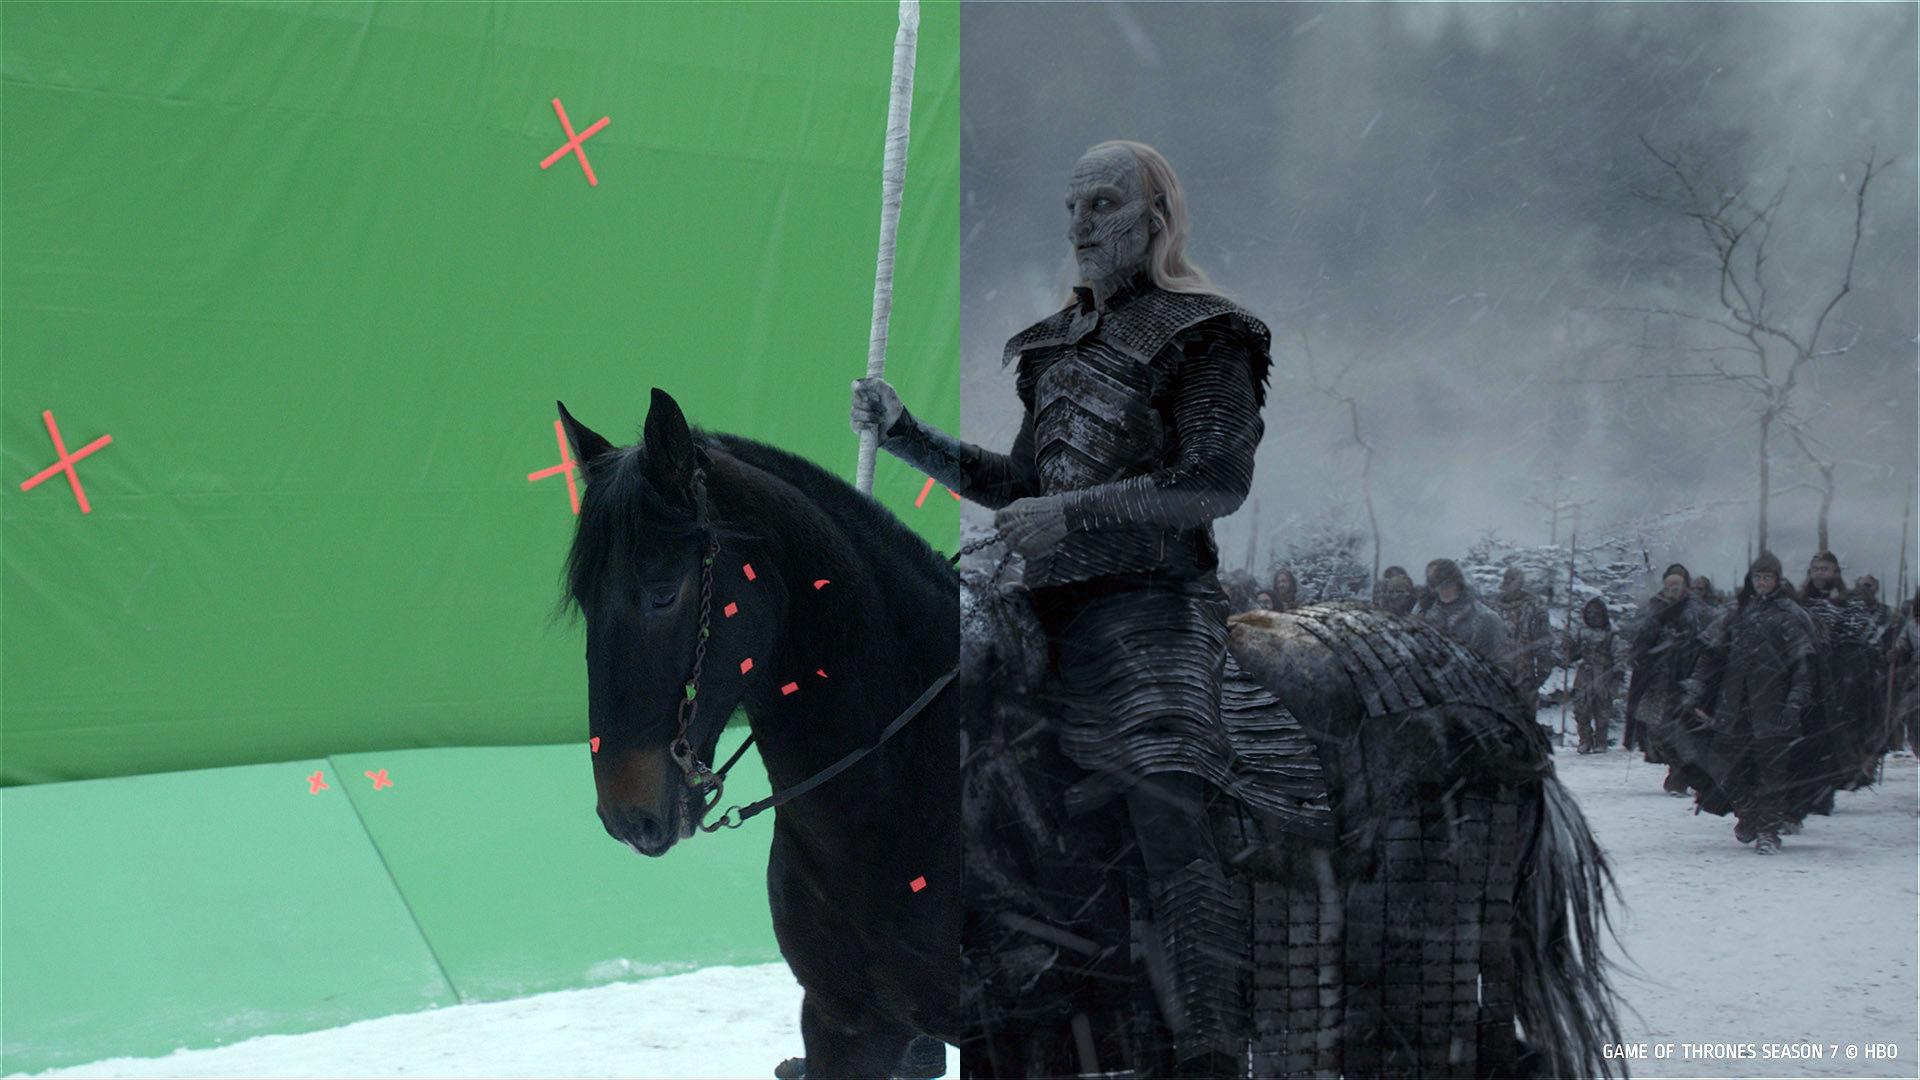 Game Of Thrones Season 7 Vfx - HD Wallpaper